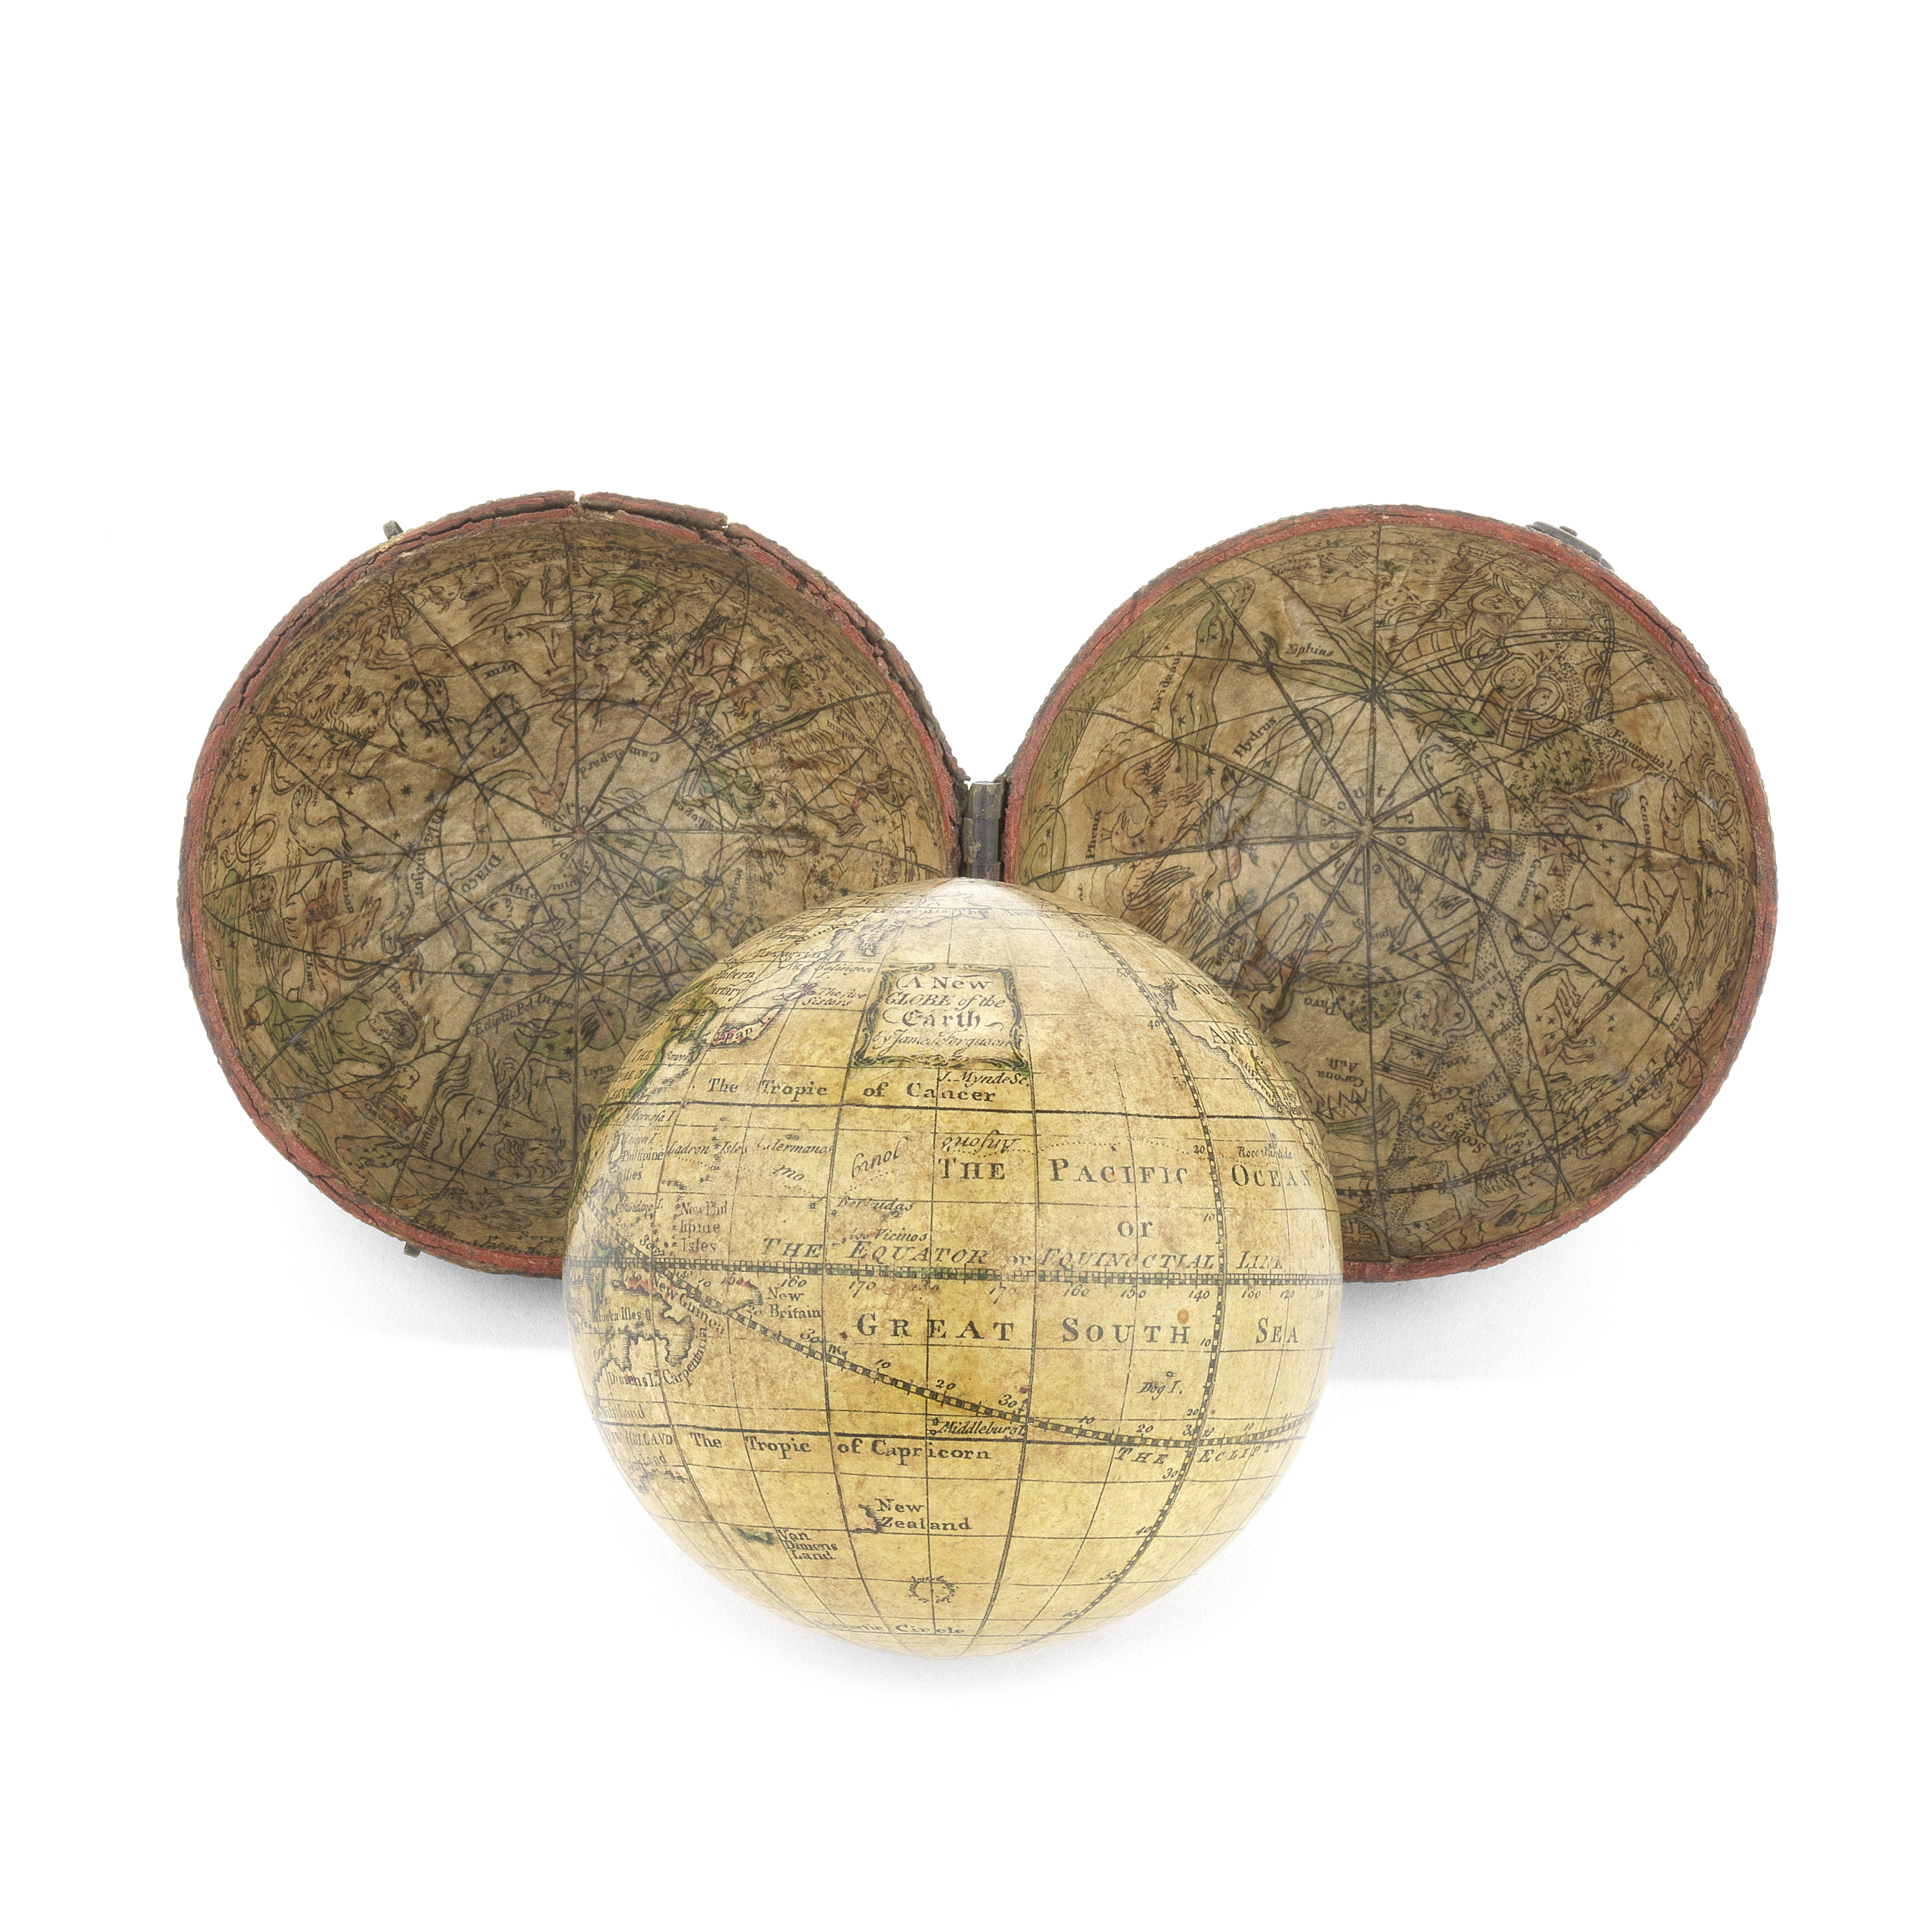 A James Ferguson 2 ¾-inch pocket globe in case, English, circa 1756,